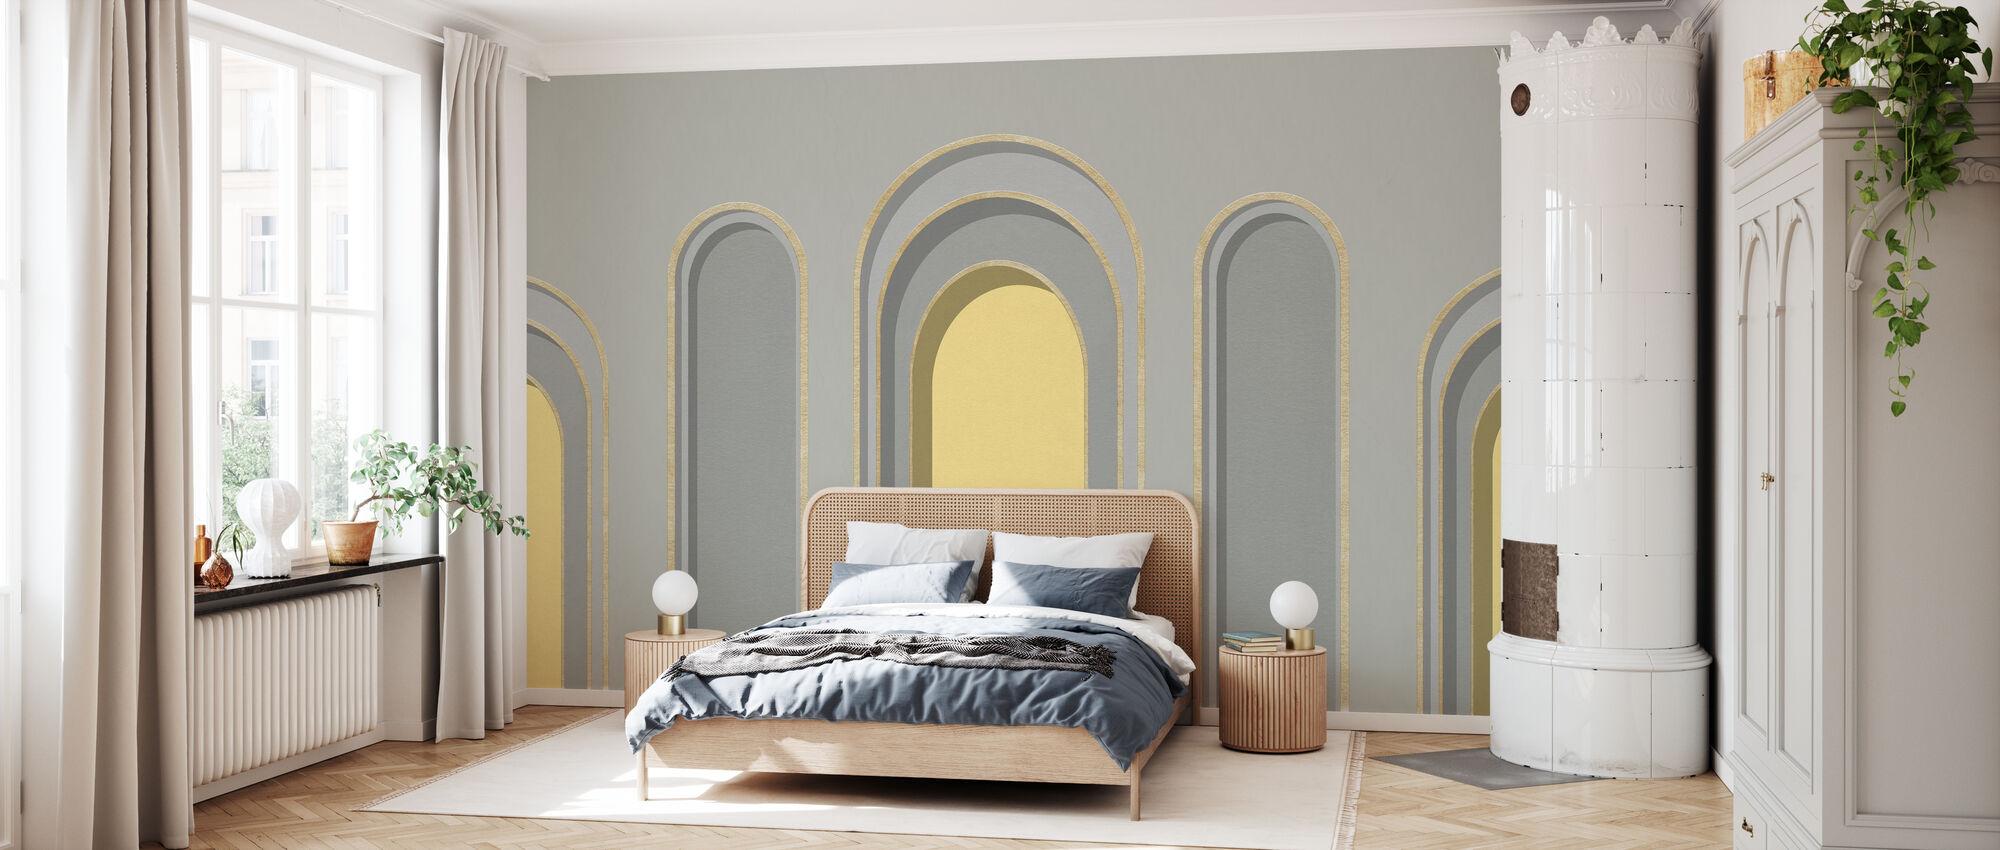 Arch Adornment - Gray Yellow - Wallpaper - Bedroom